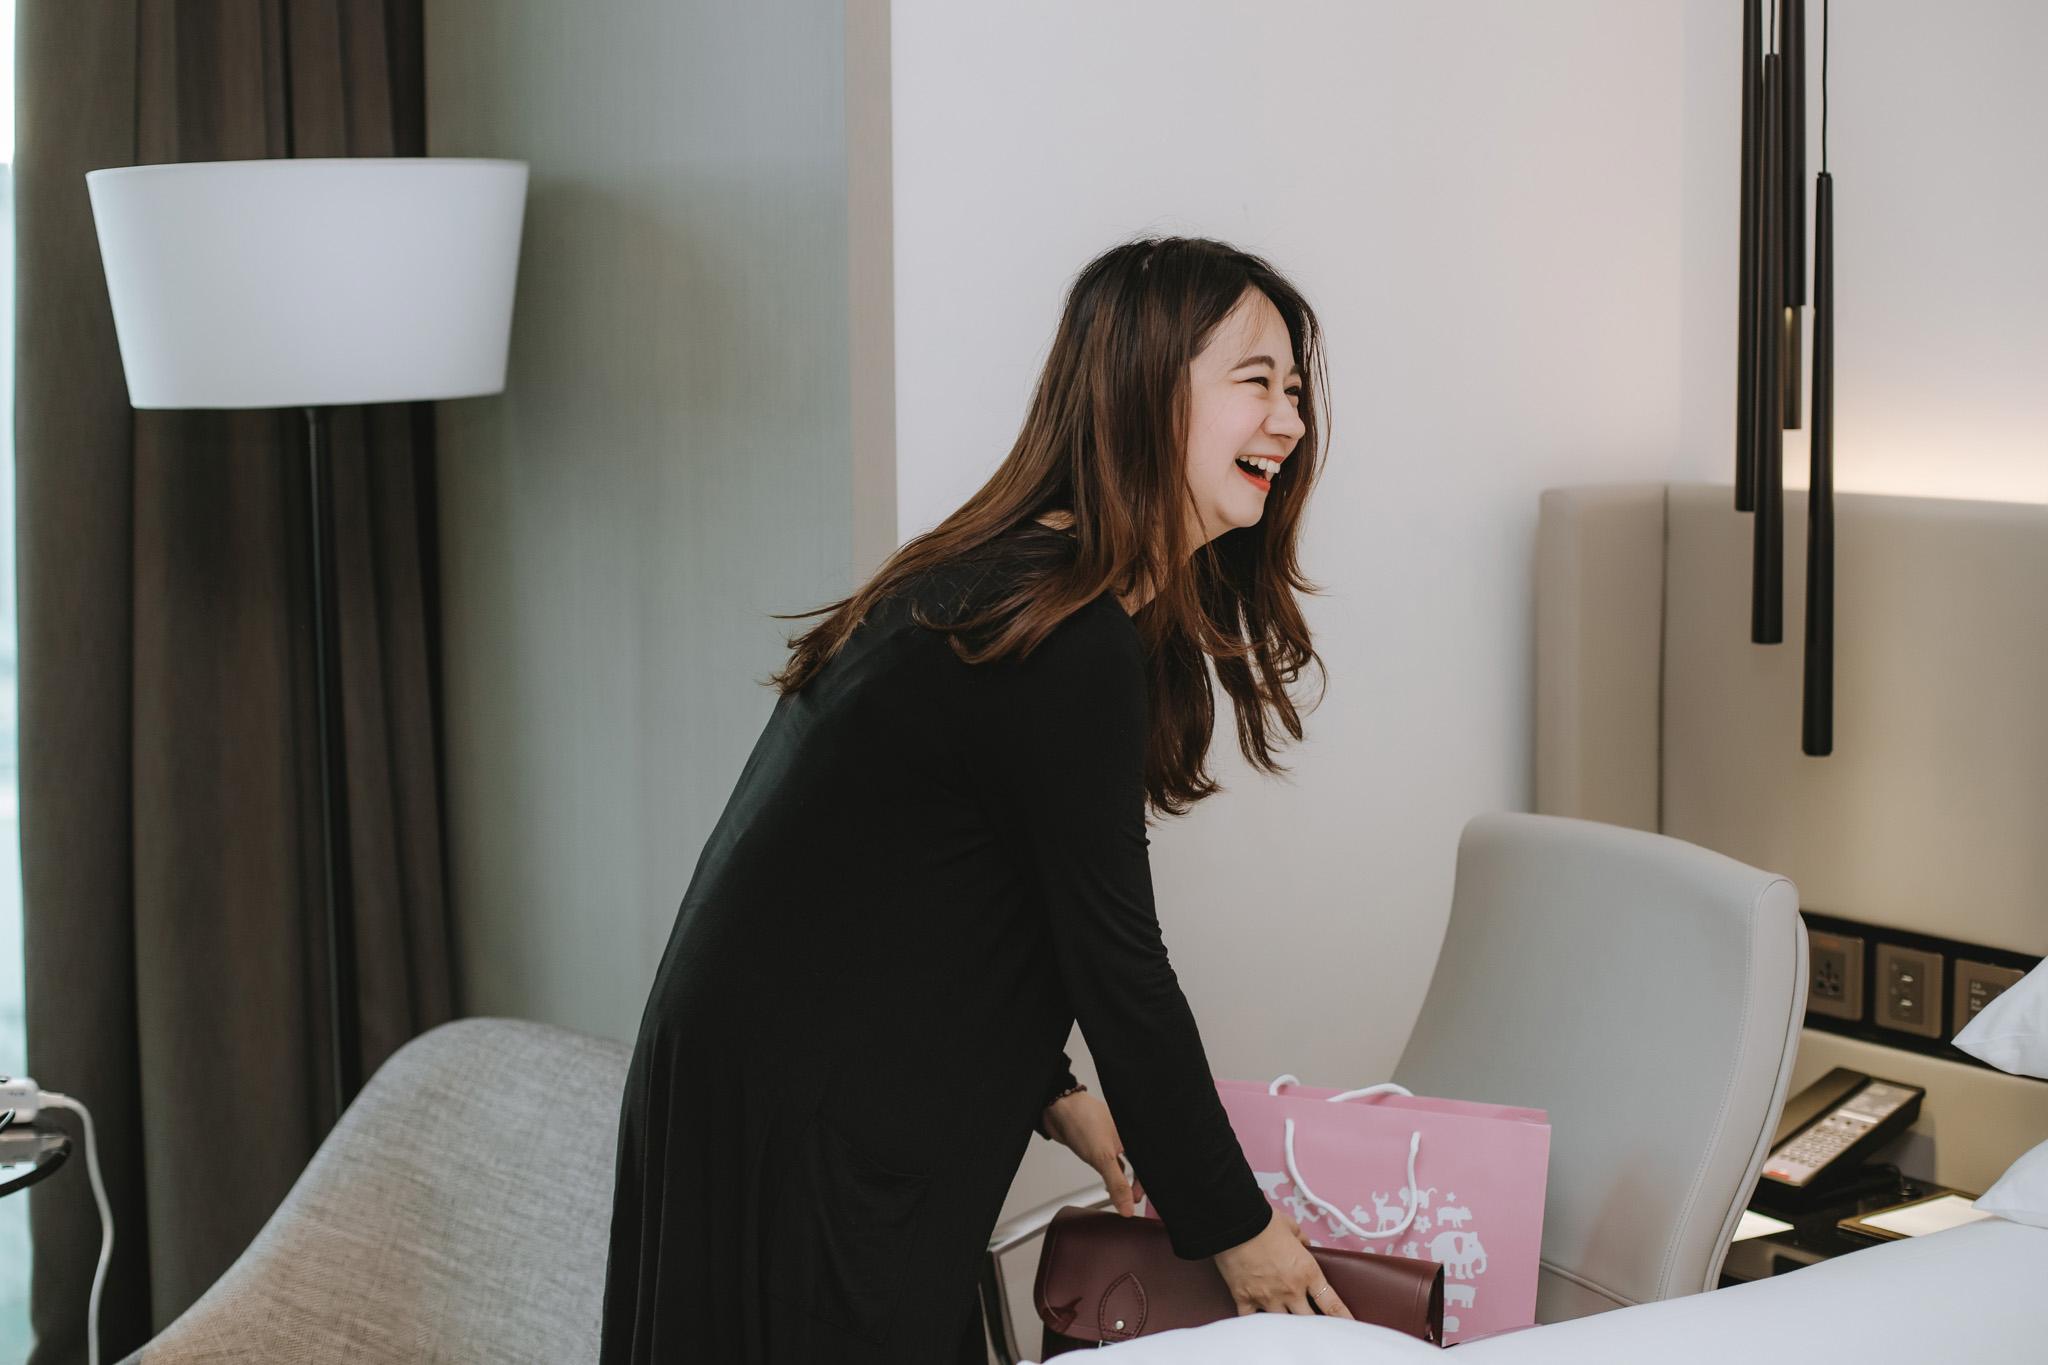 EW 居米 台北禮服 台北婚紗 台北婚攝 國泰萬怡 台北婚禮-14